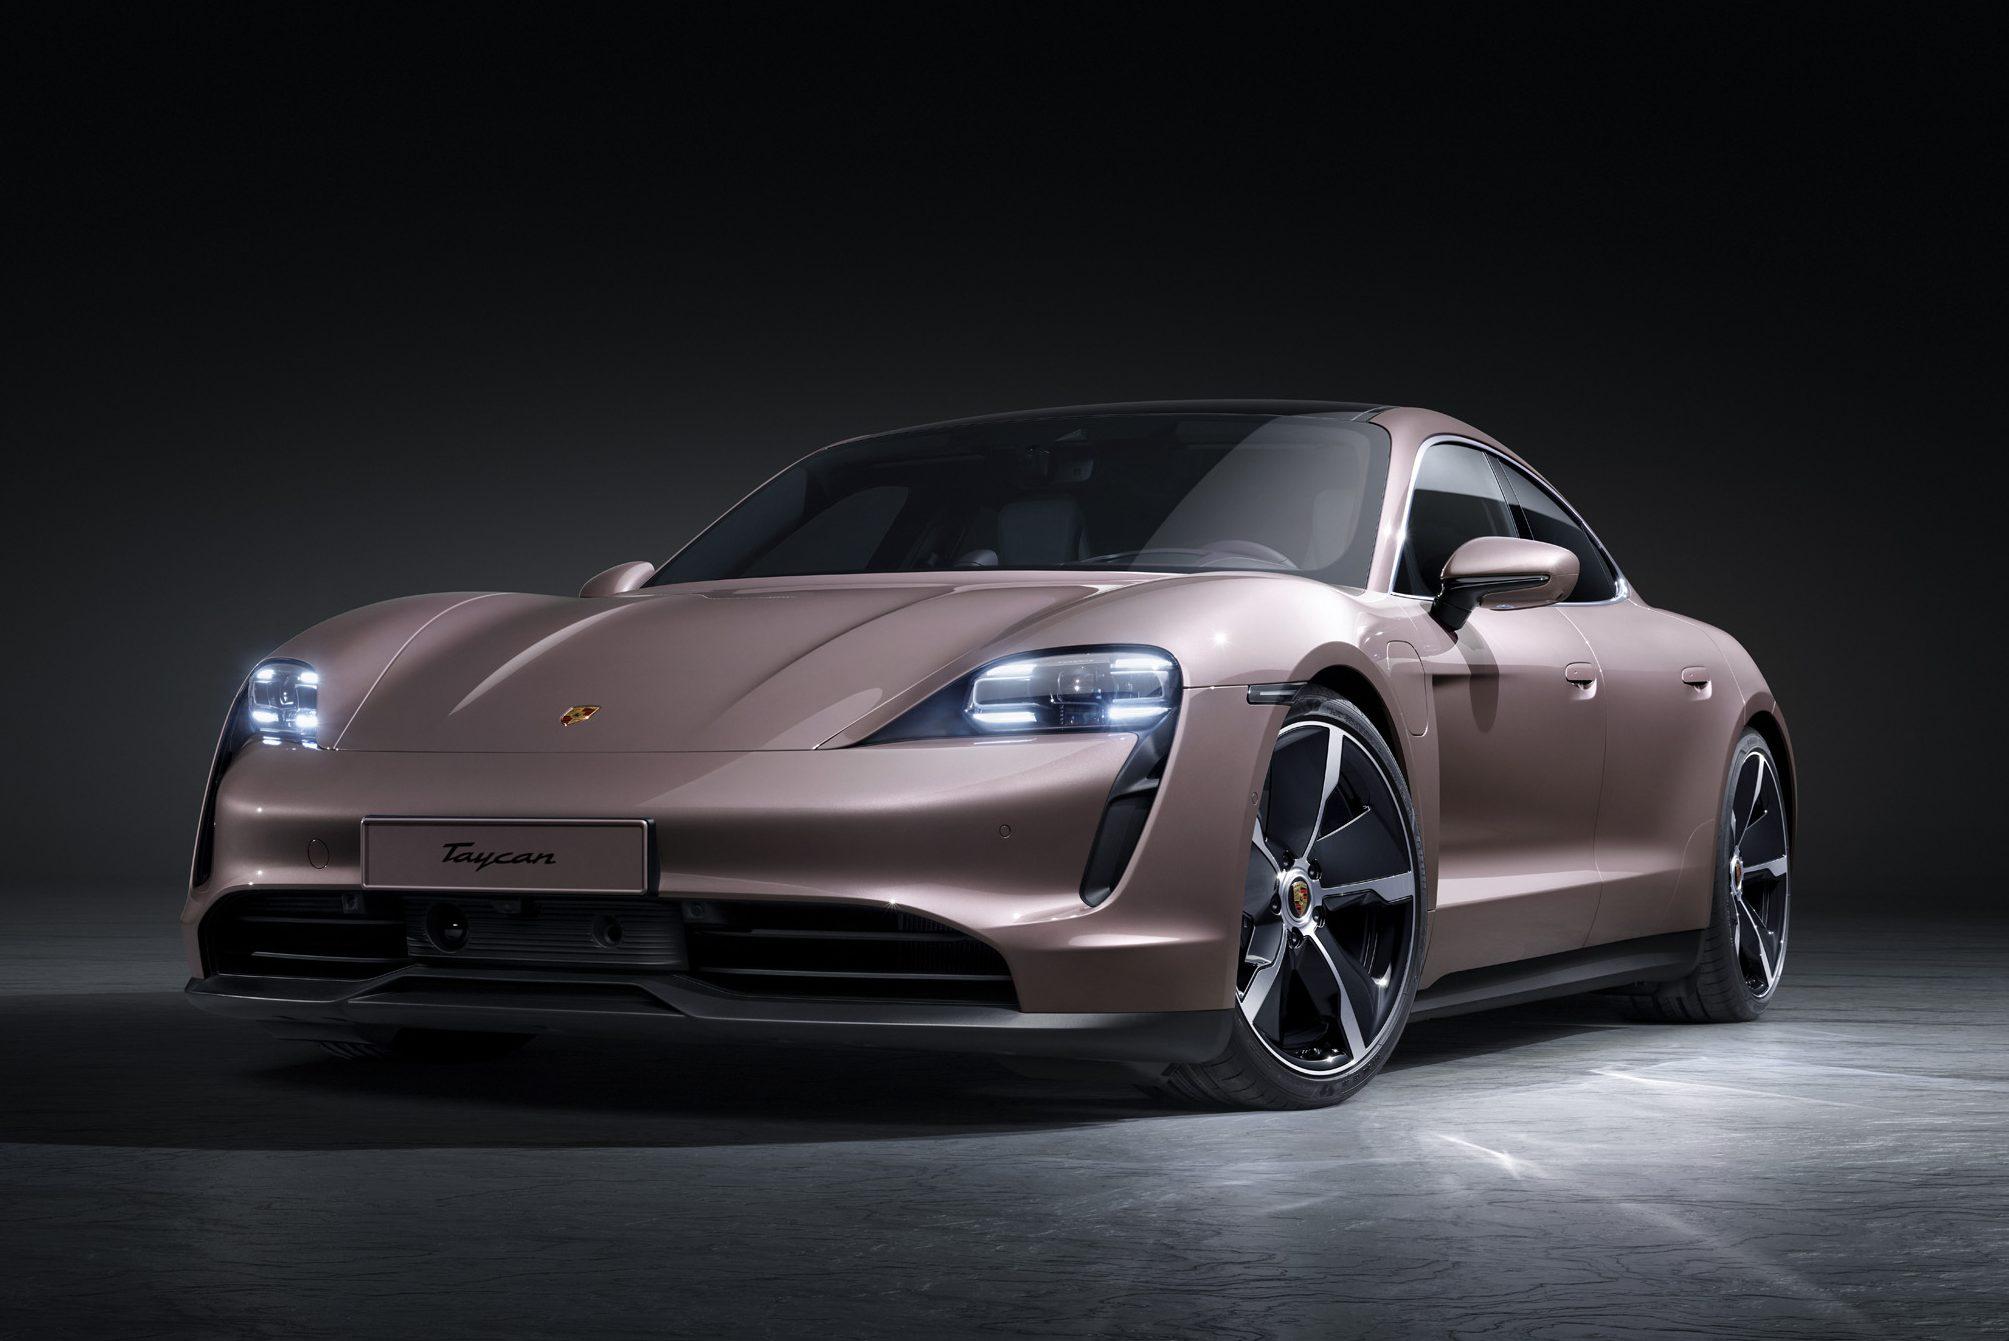 Porsche Taycan Basico Chega Ao Brasil Com Ate 380 Cv E Tracao Traseira Quatro Rodas